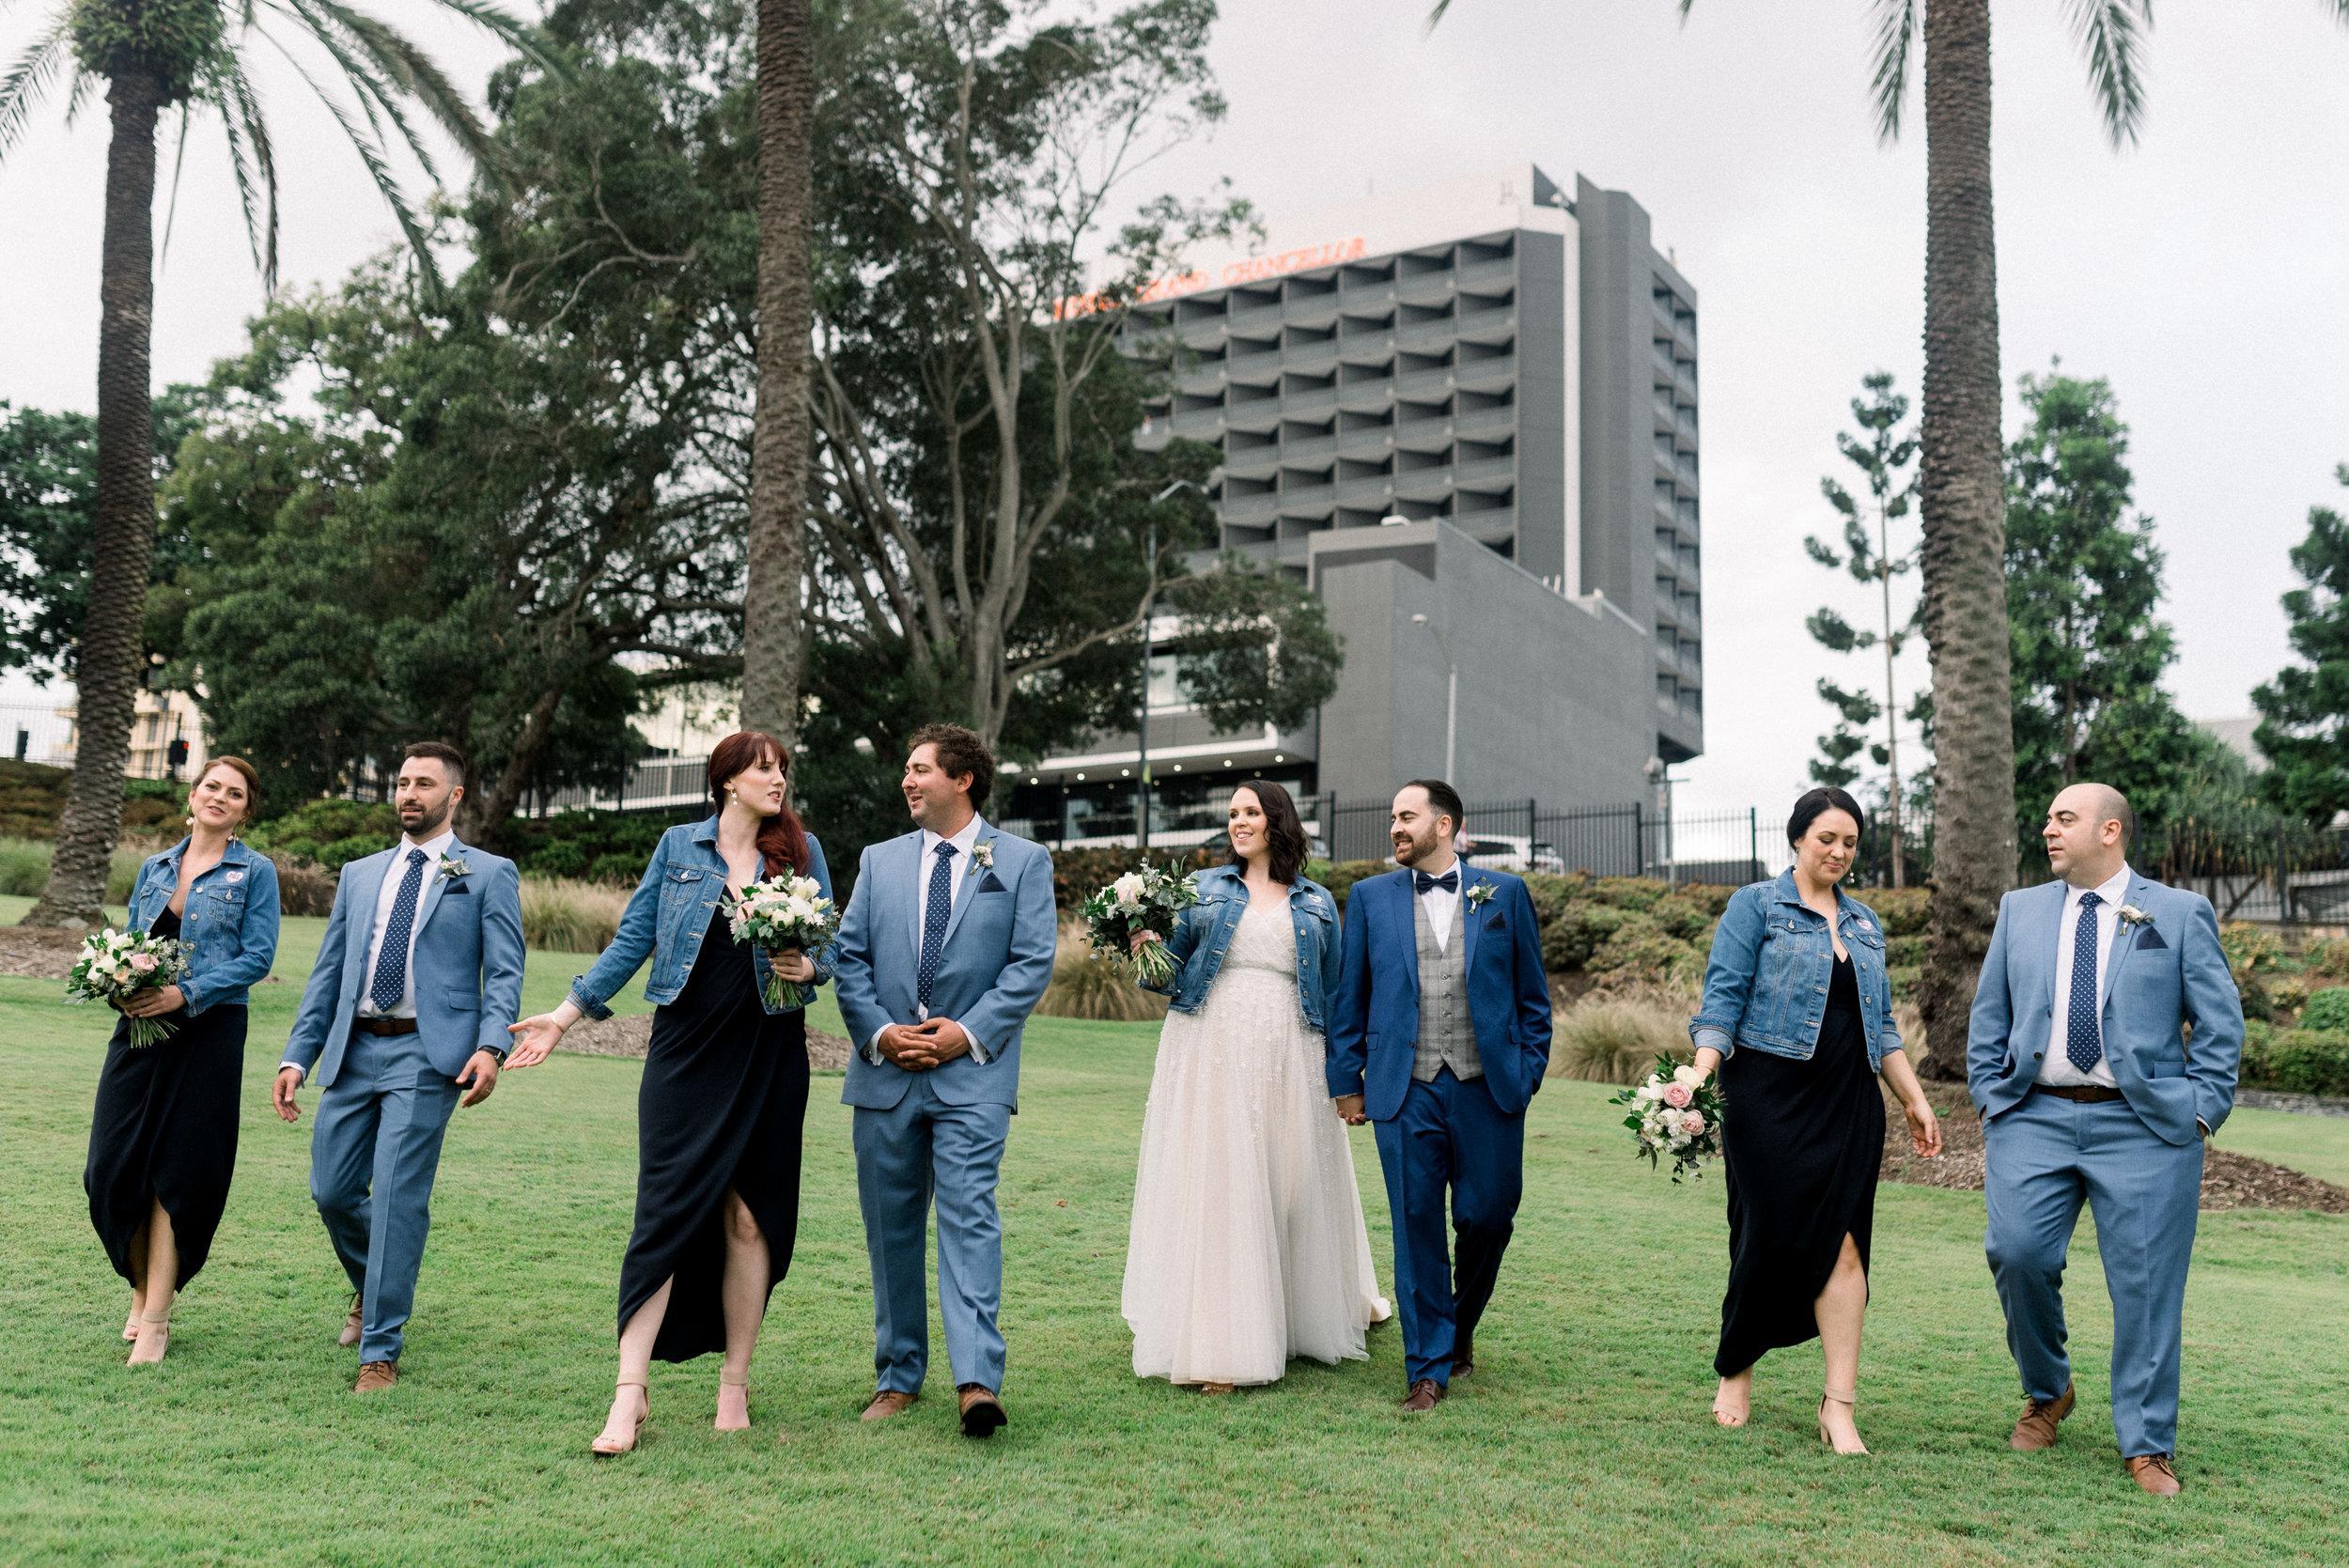 brisbane-city-wedding-photographer-romantic-wedding-78.jpg